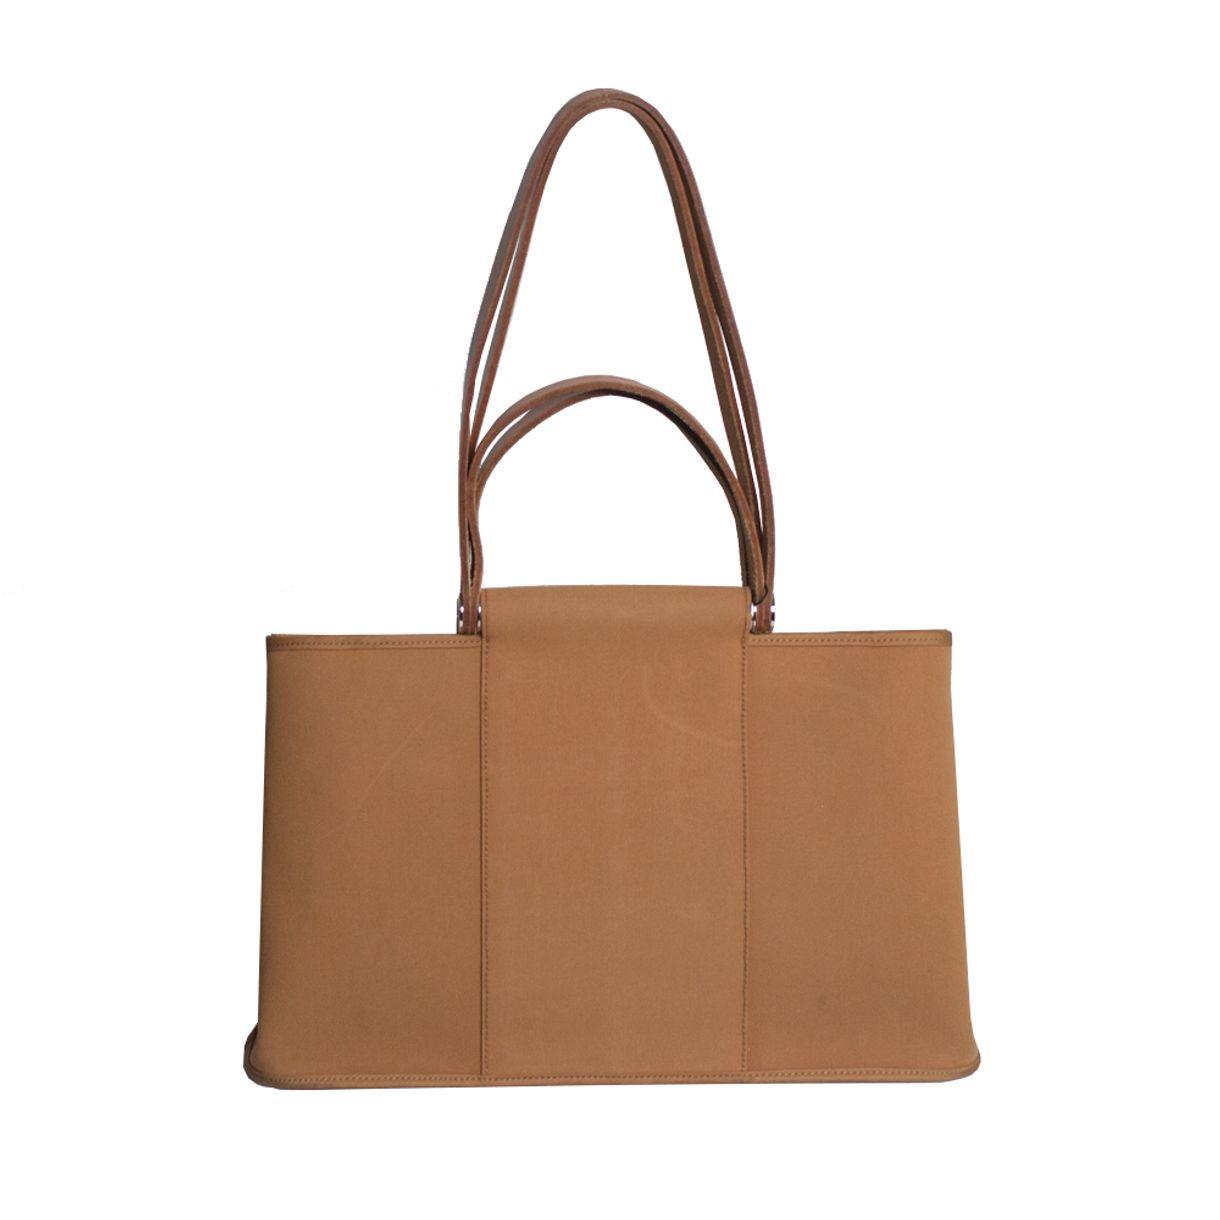 Bolsa-Hermes-Cabag-Elan-Tote-Caramelo